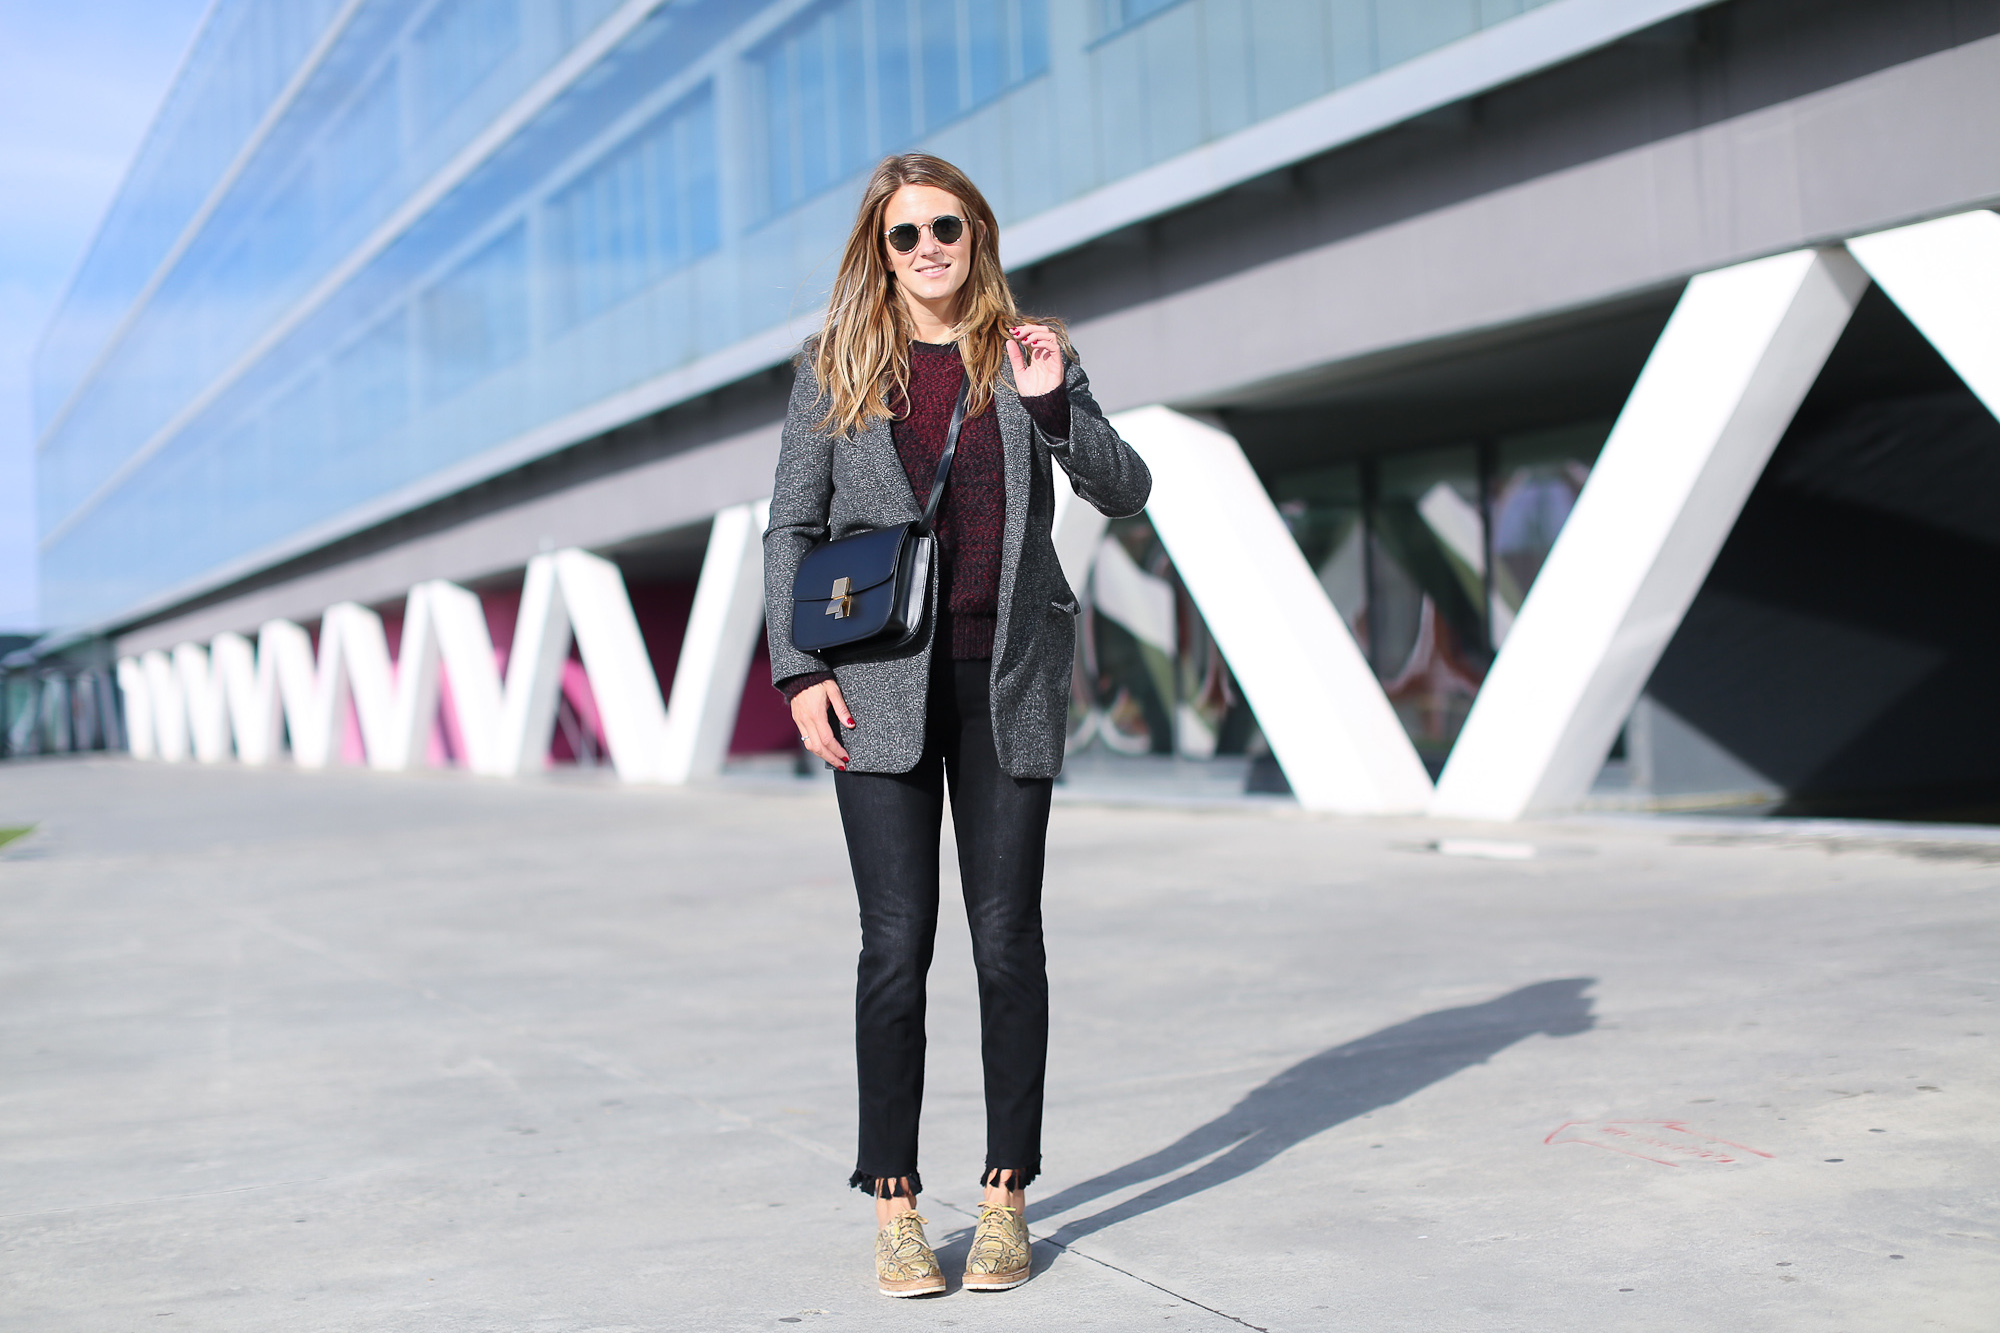 Clochet_streetstyle_fashionblogger_bilbao_zapatospielpertiniestampadoserpientepiton_zarajeansborlaspompones